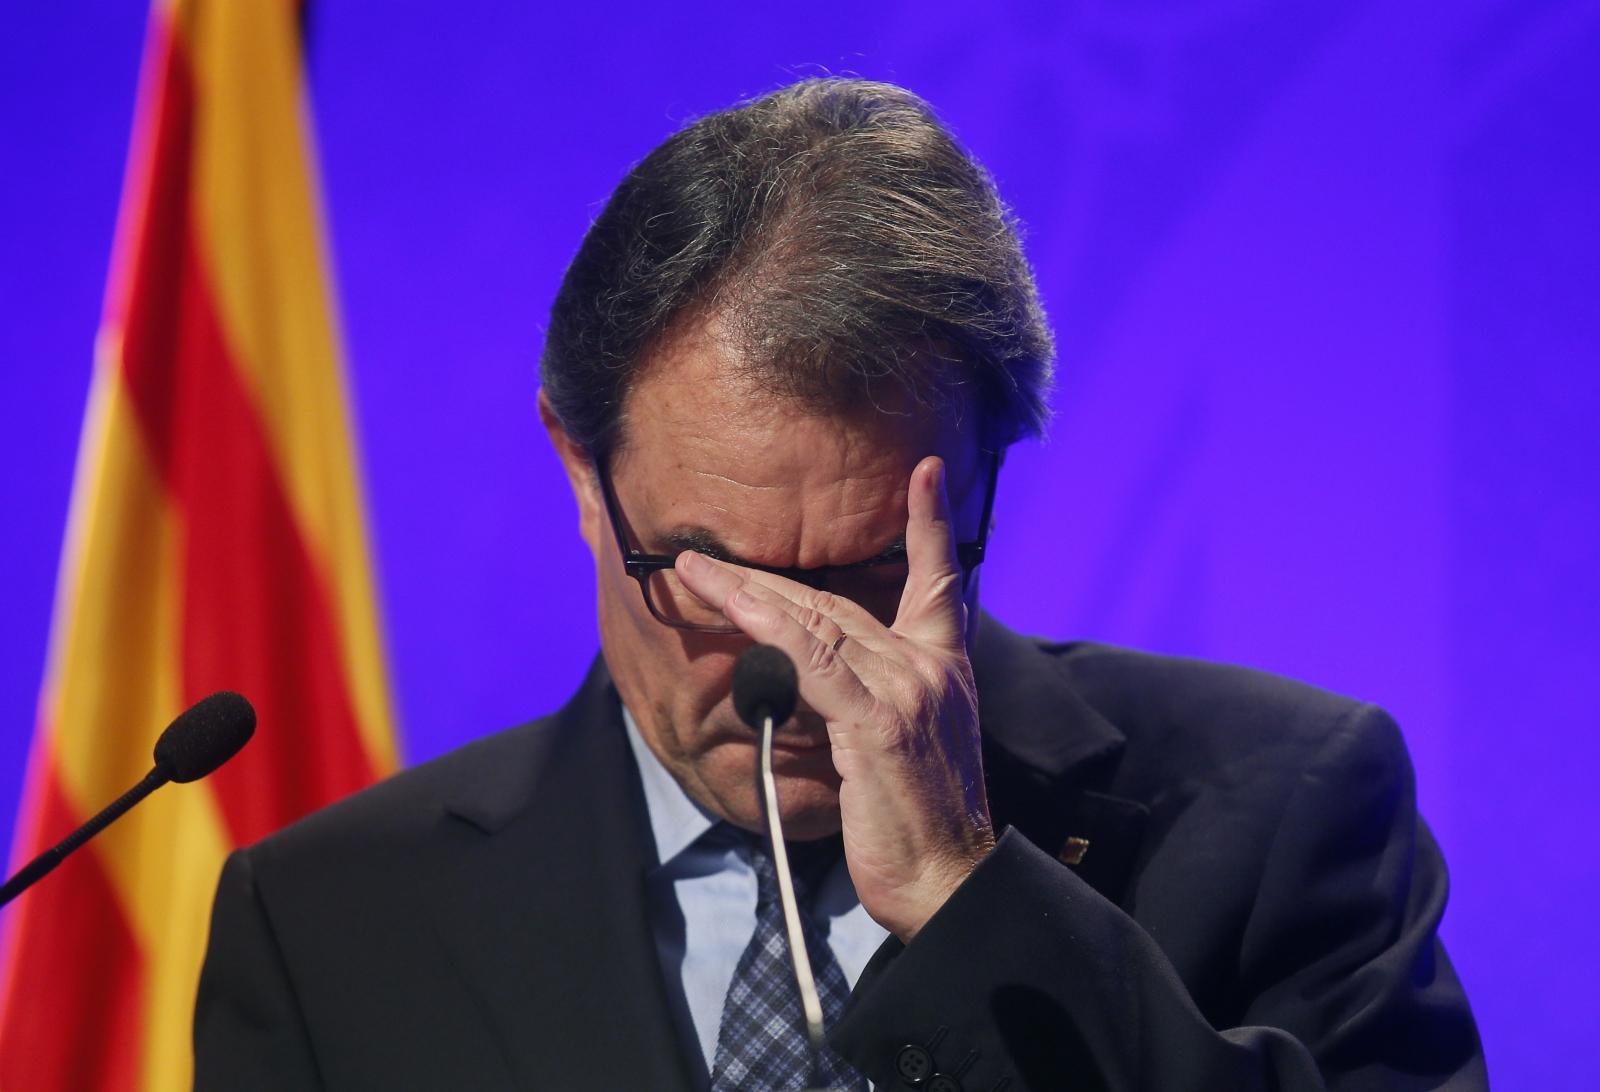 Catalan President Artur Mas gestures during a news conference at Palau de la Generalitat in Barcelona, November 11, 2014